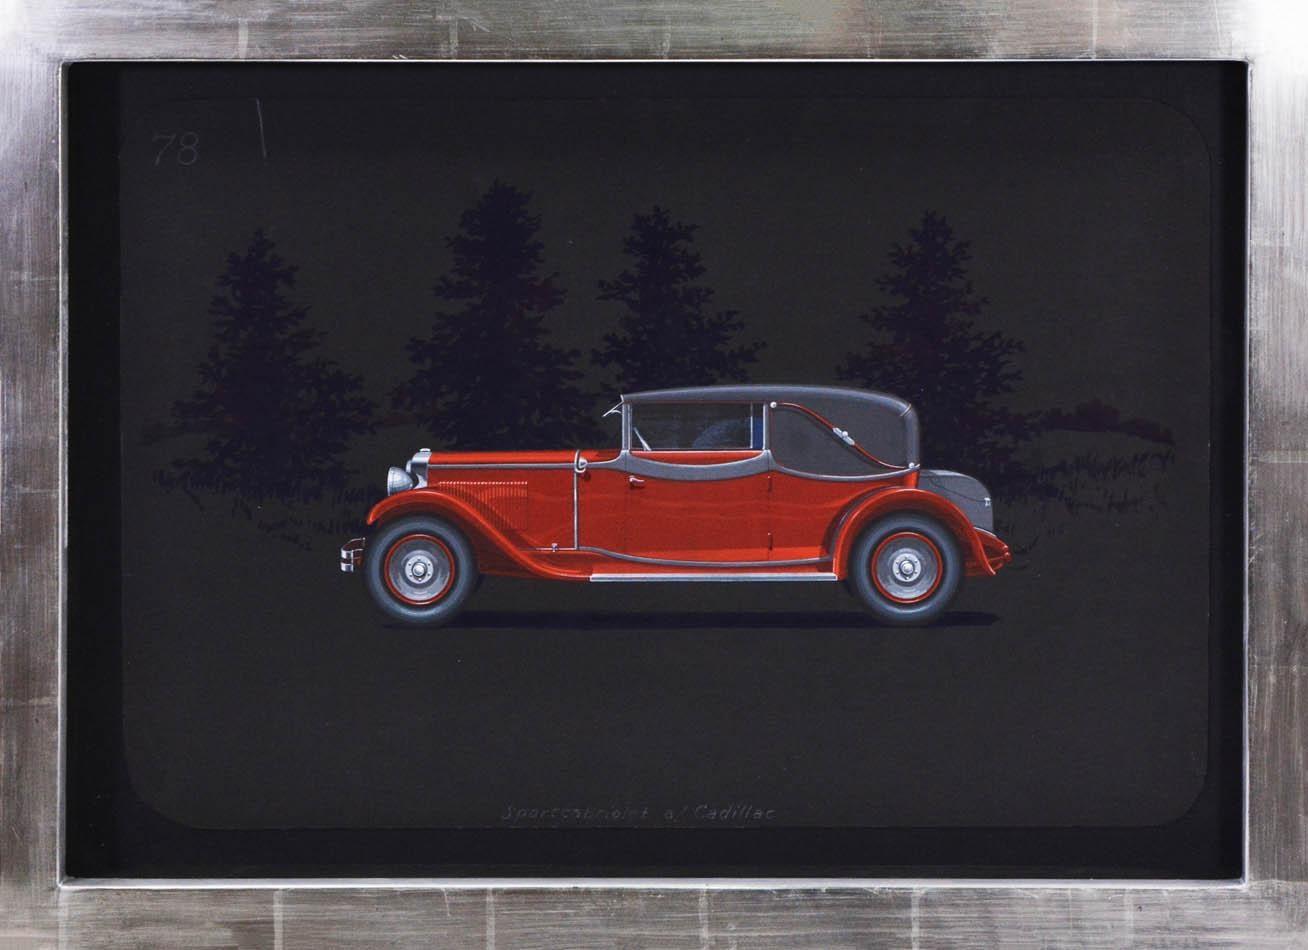 Sportcabriolet coachwork design by Alexis Kellner AG for the Cadillac 341-A.